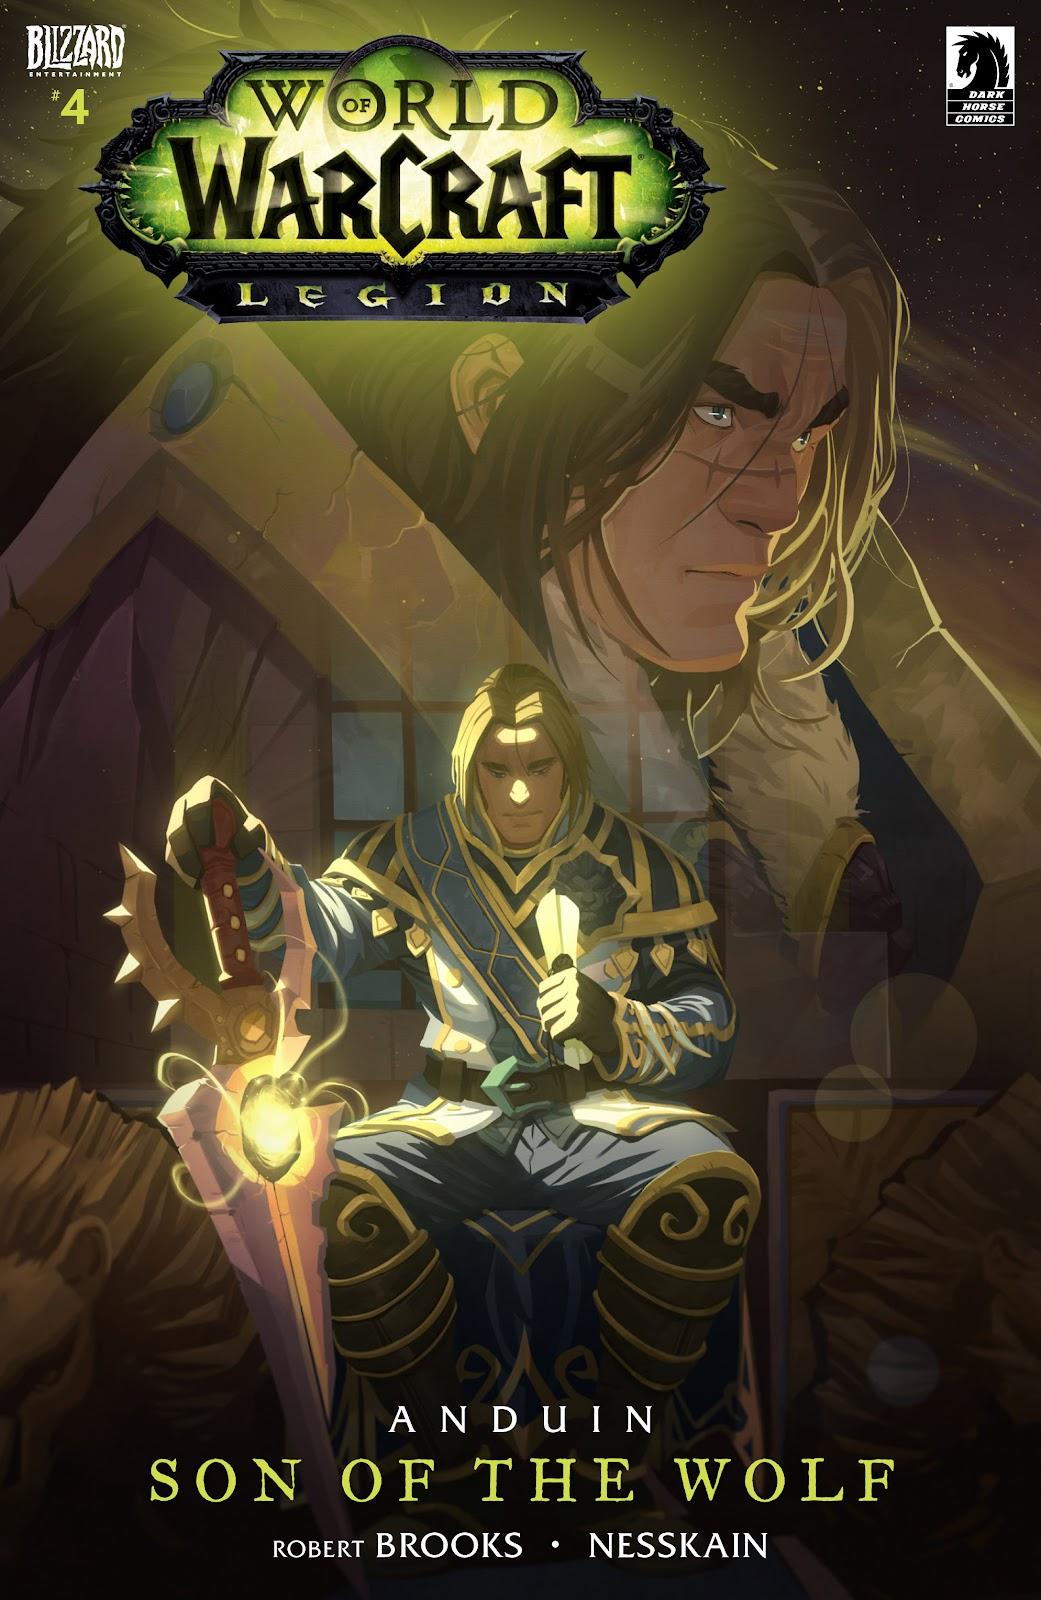 World of Warcraft: Legion 4 Page 1